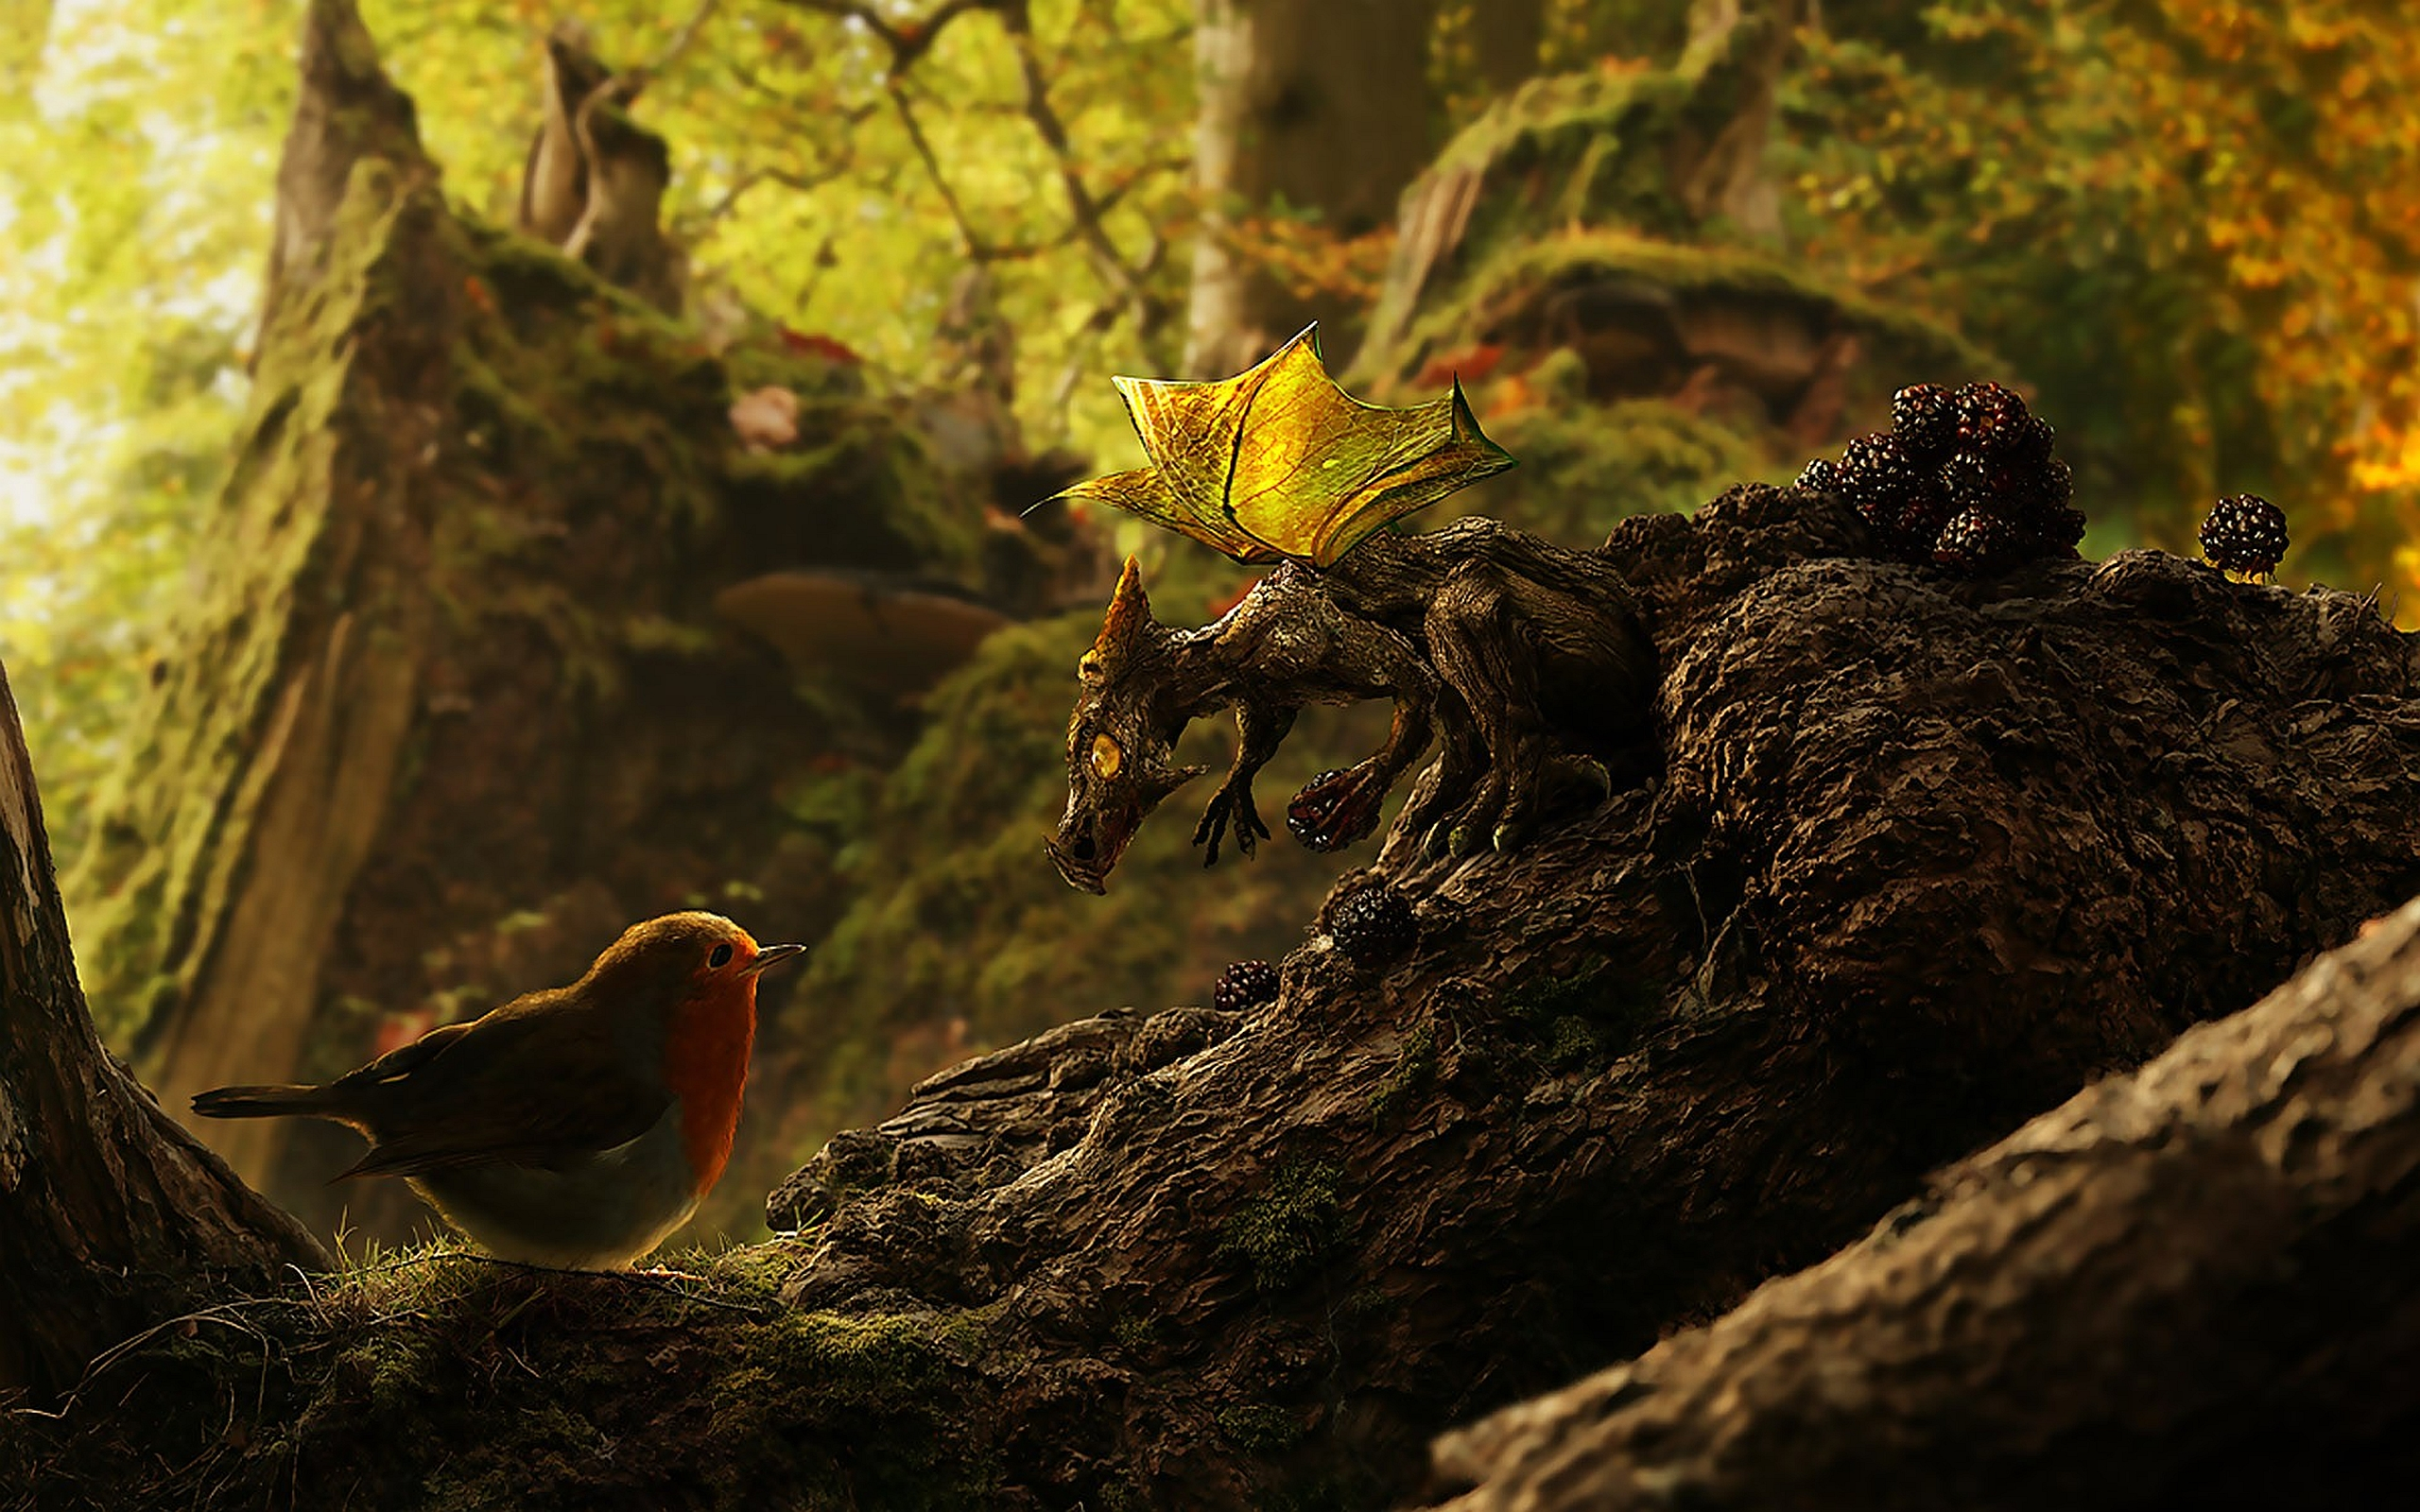 Creature full hd wallpaper and background 2560x1600 id - Fantasy wallpaper digital art ...